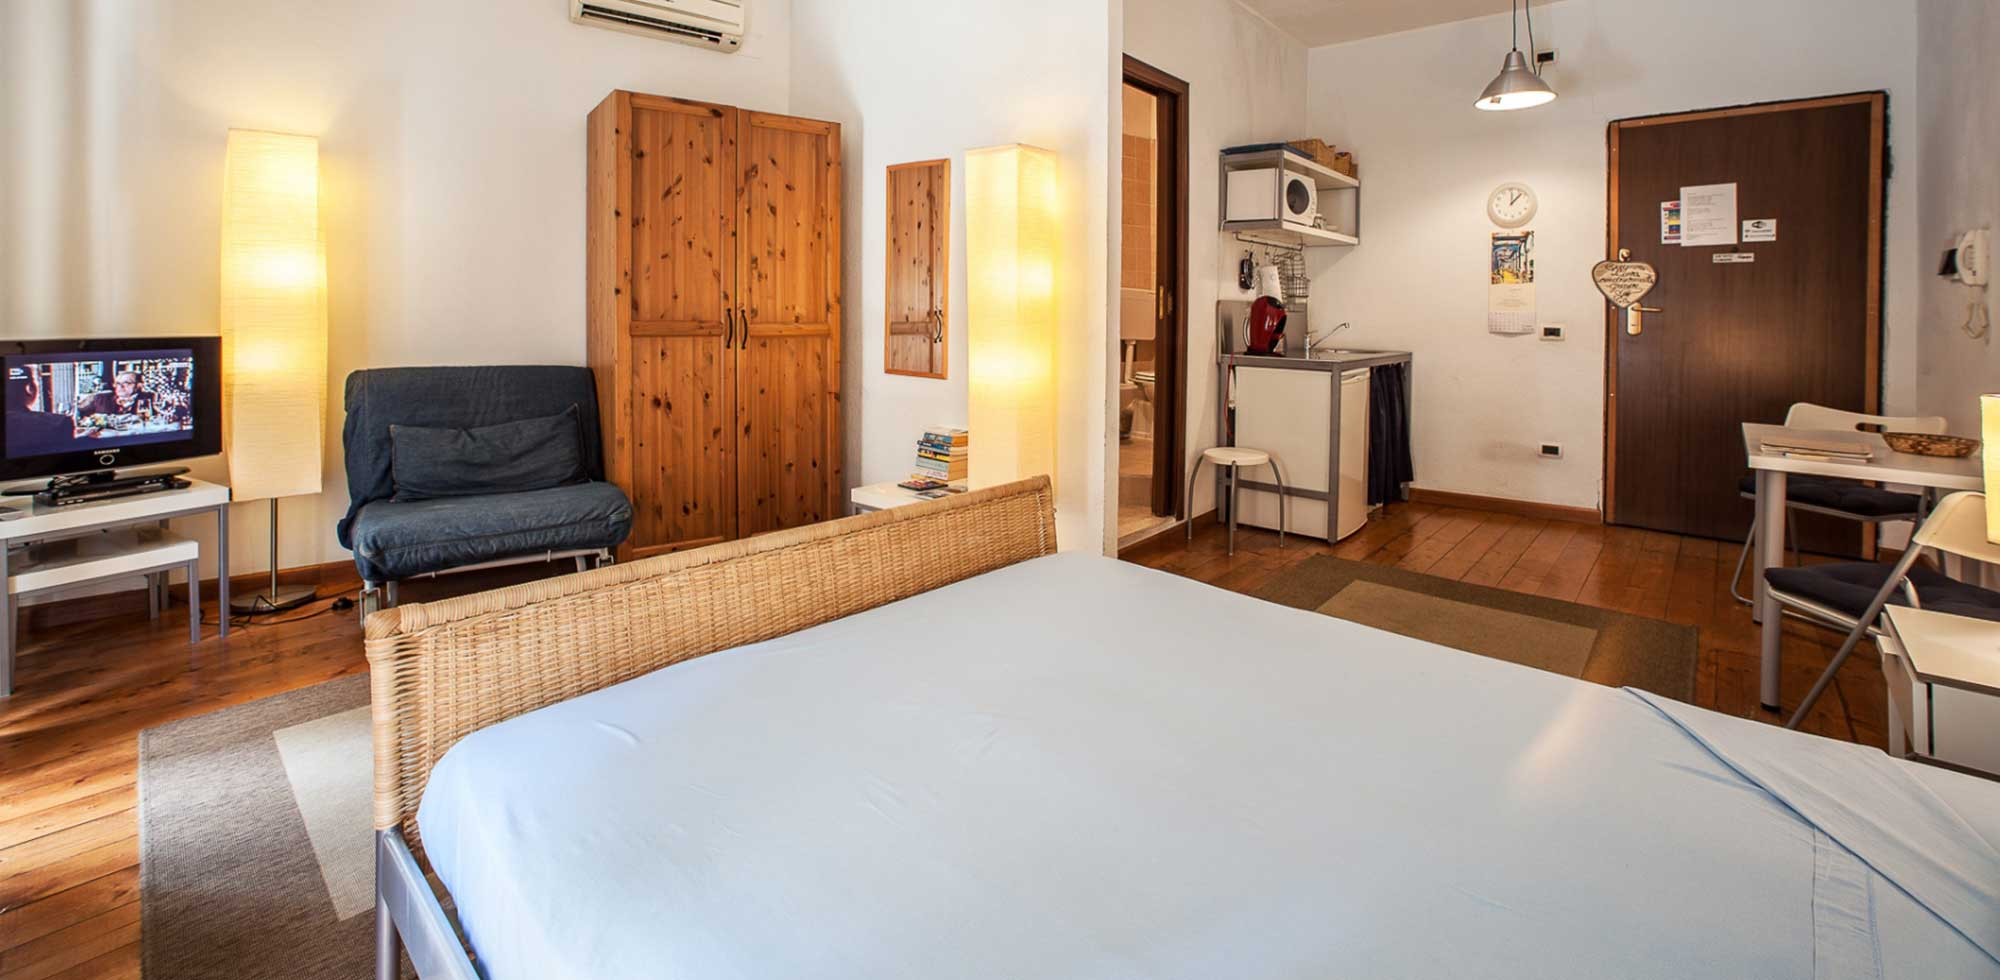 Centro Storico Via Manno Bed and Breakfast